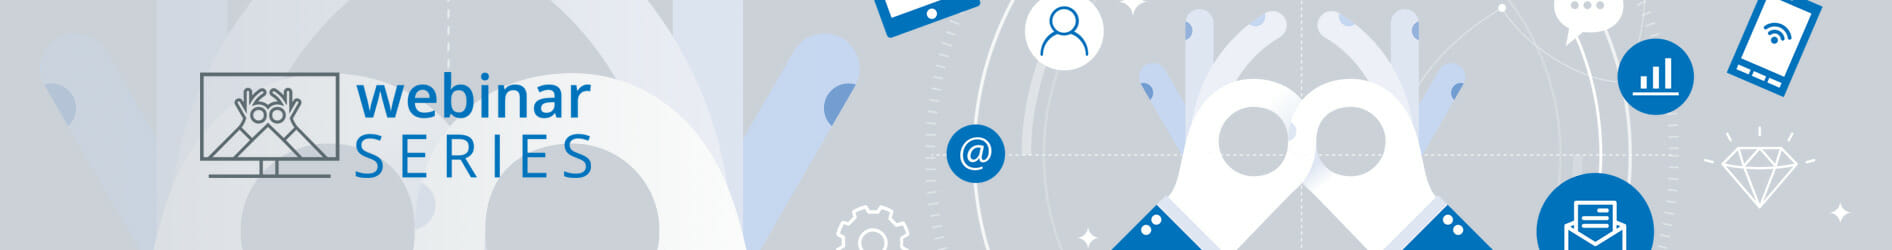 Contactlab Webinar Series